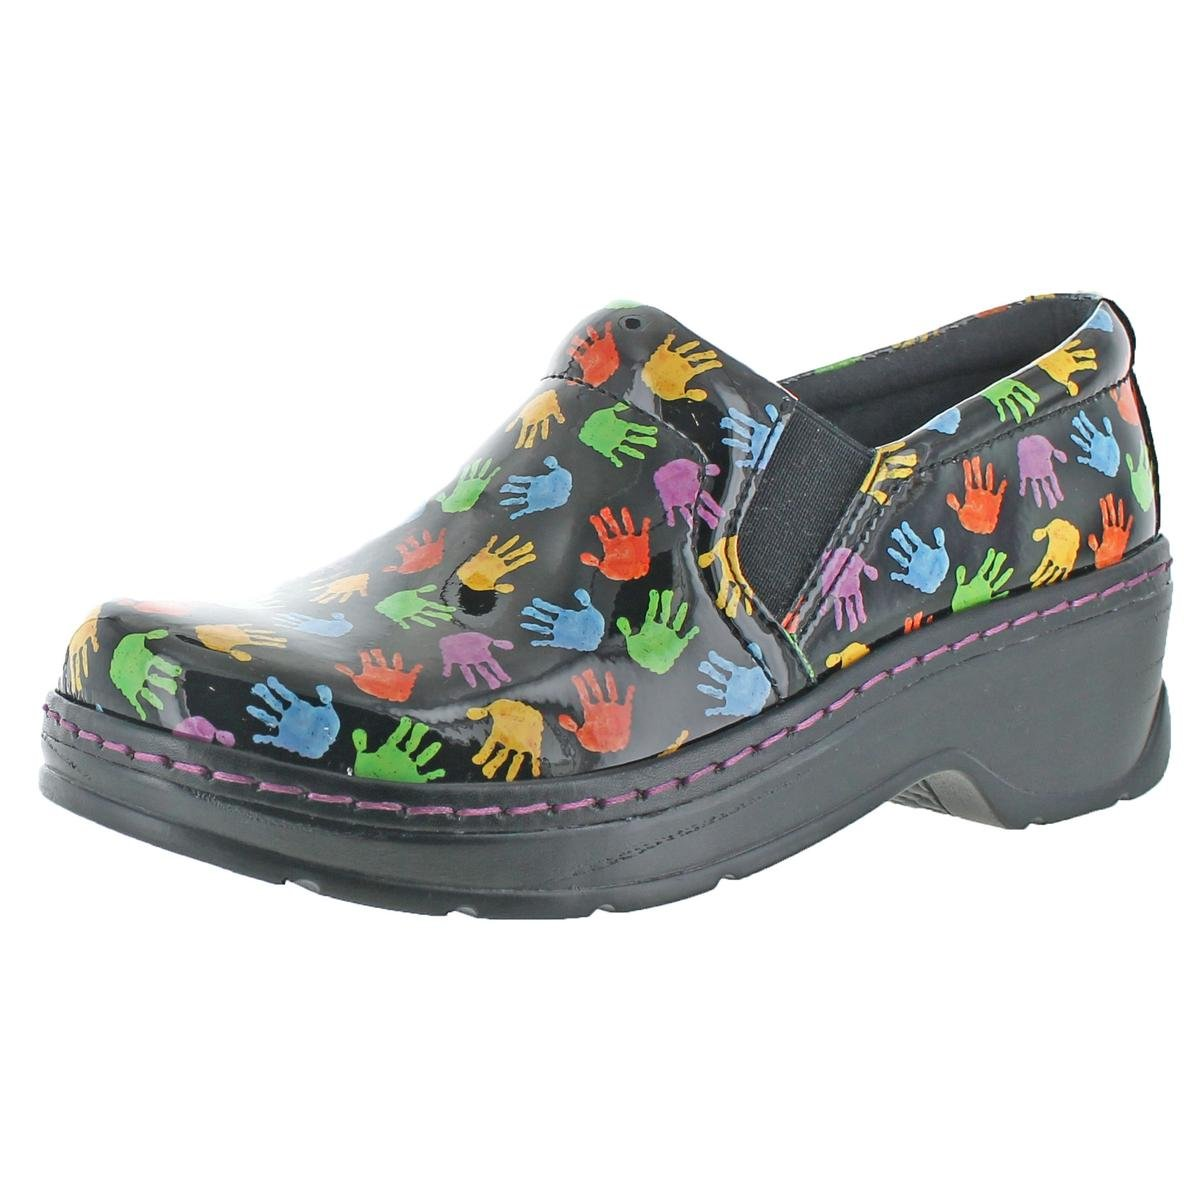 Klogs Unisex Naples Hands Patent Shoes - 10 B(M) US by Klogs